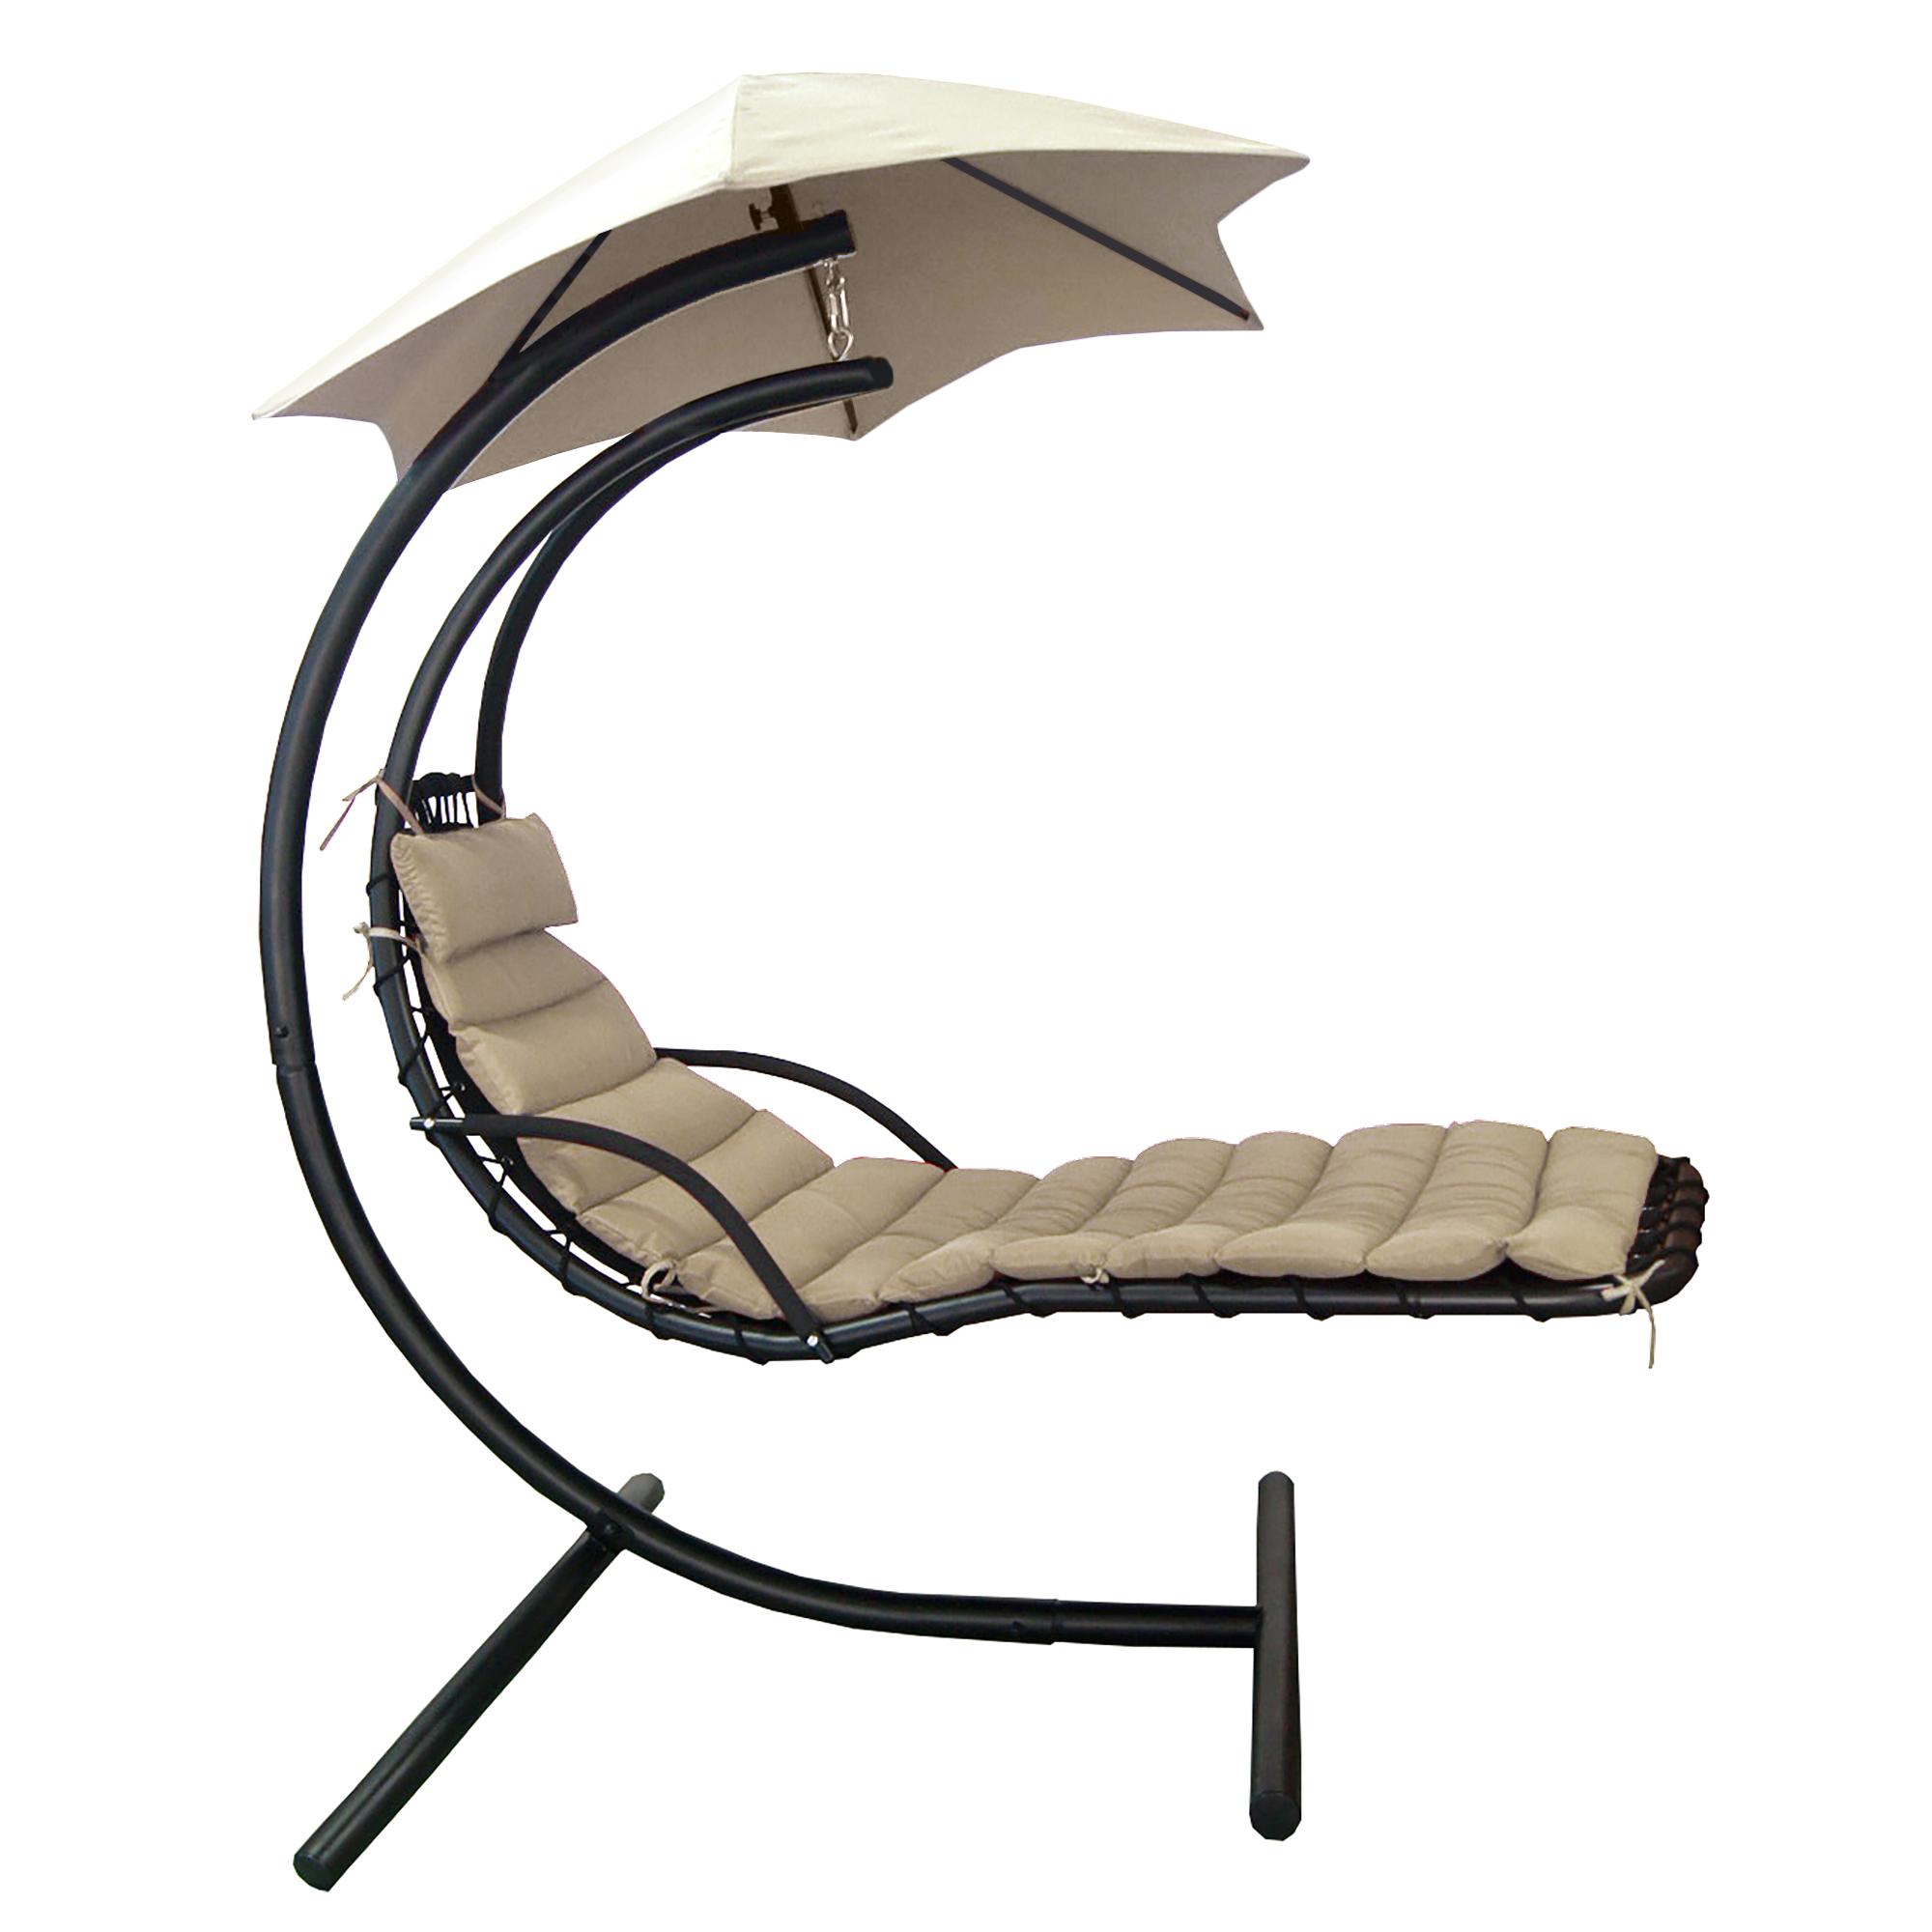 Heat Pump Canopy : Island umbrella retreat hanging lounge w shade